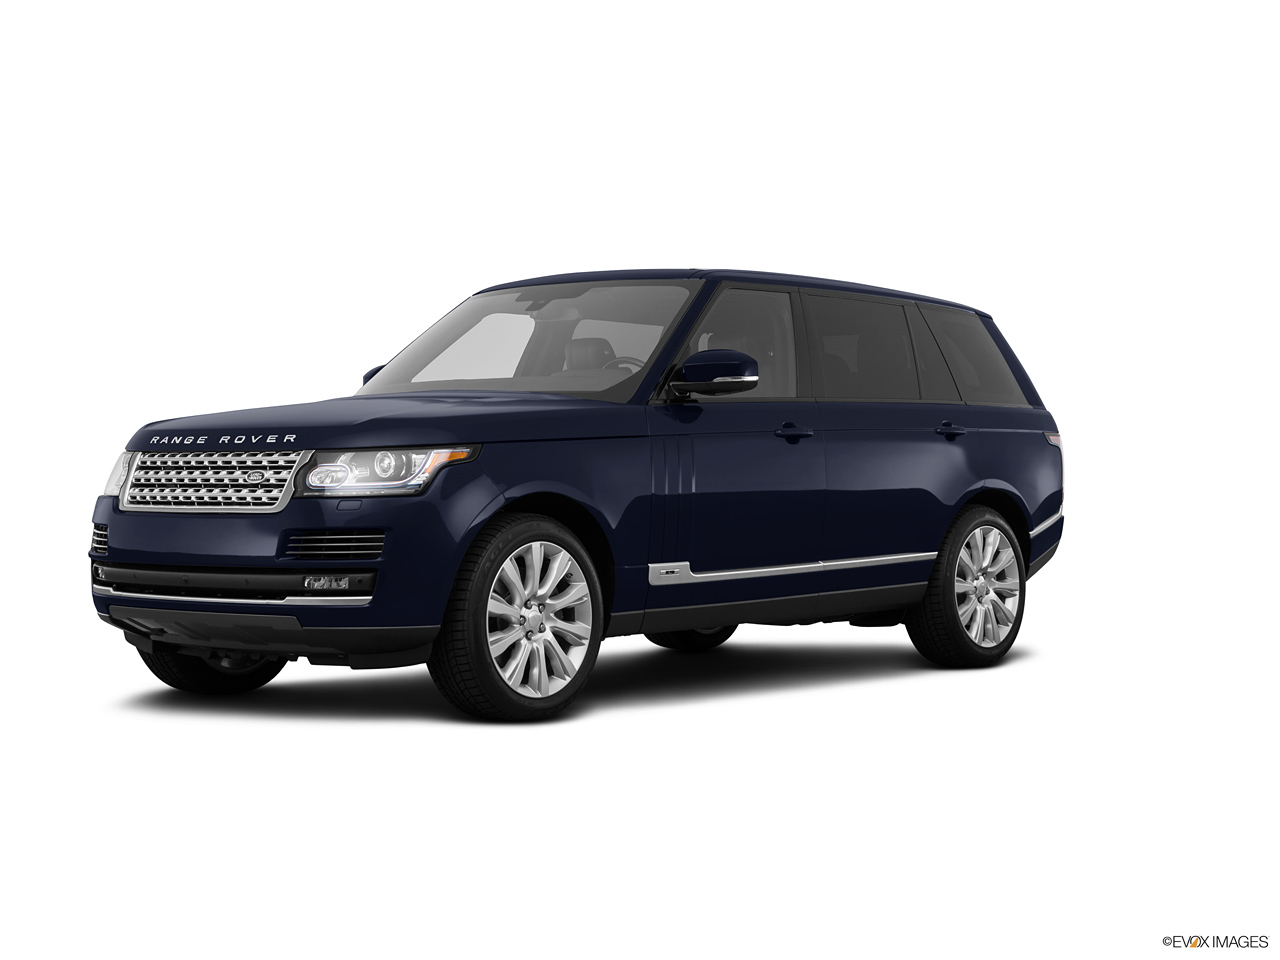 Land Rover Range Rover 2017 5 0l Sc Vogue Se Lwb 510 Ps In